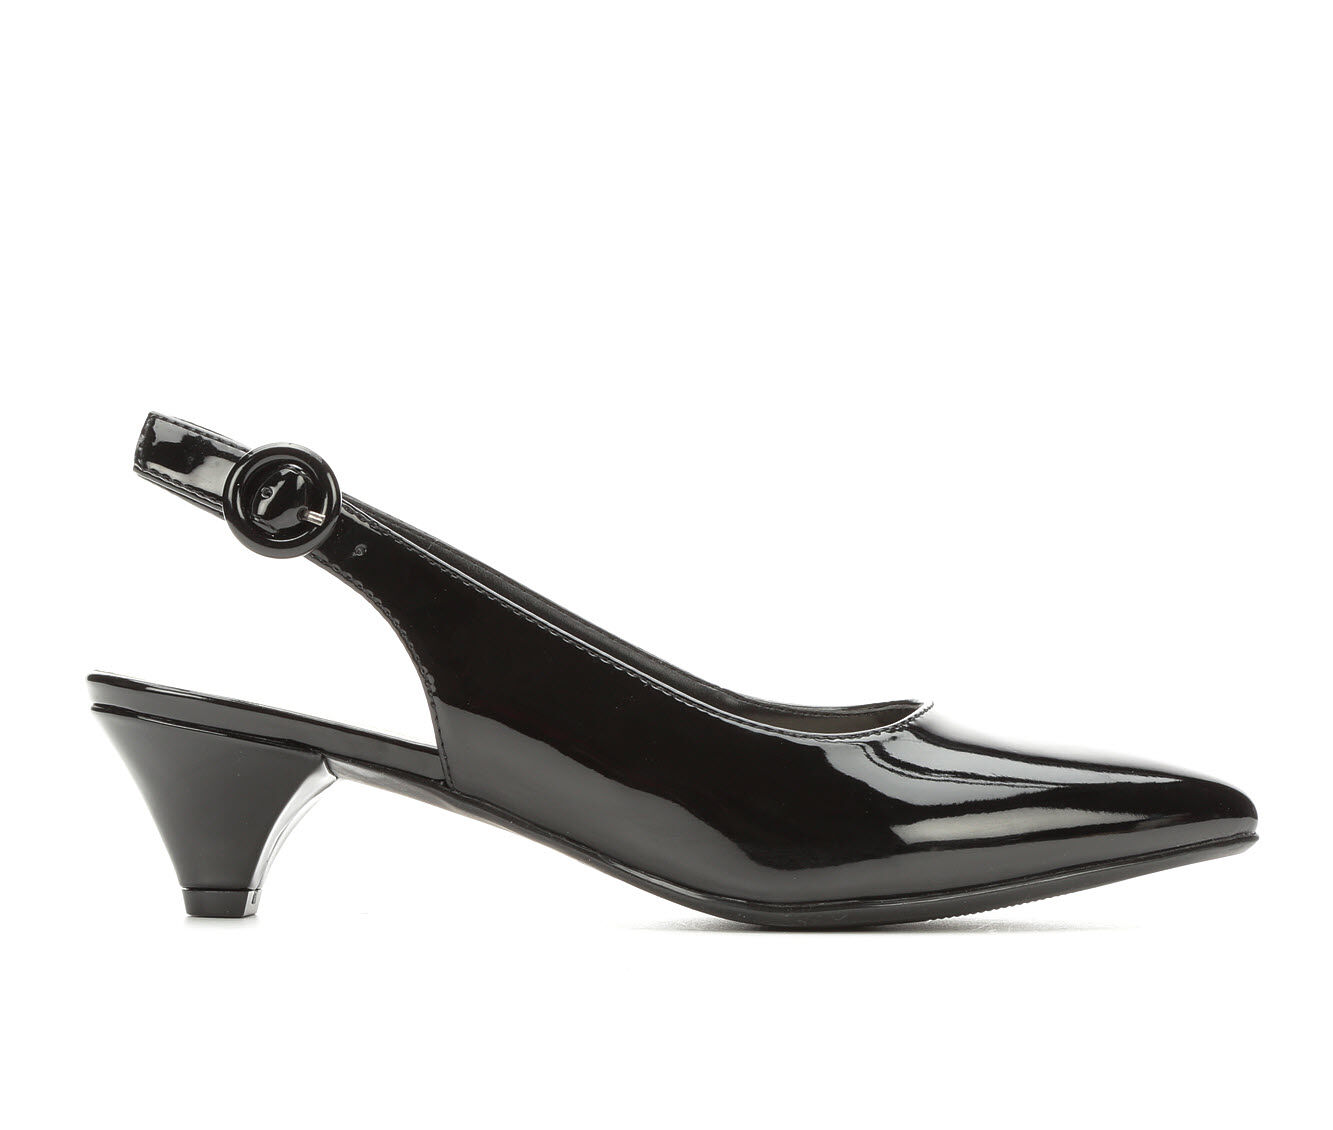 uk shoes_kd6215